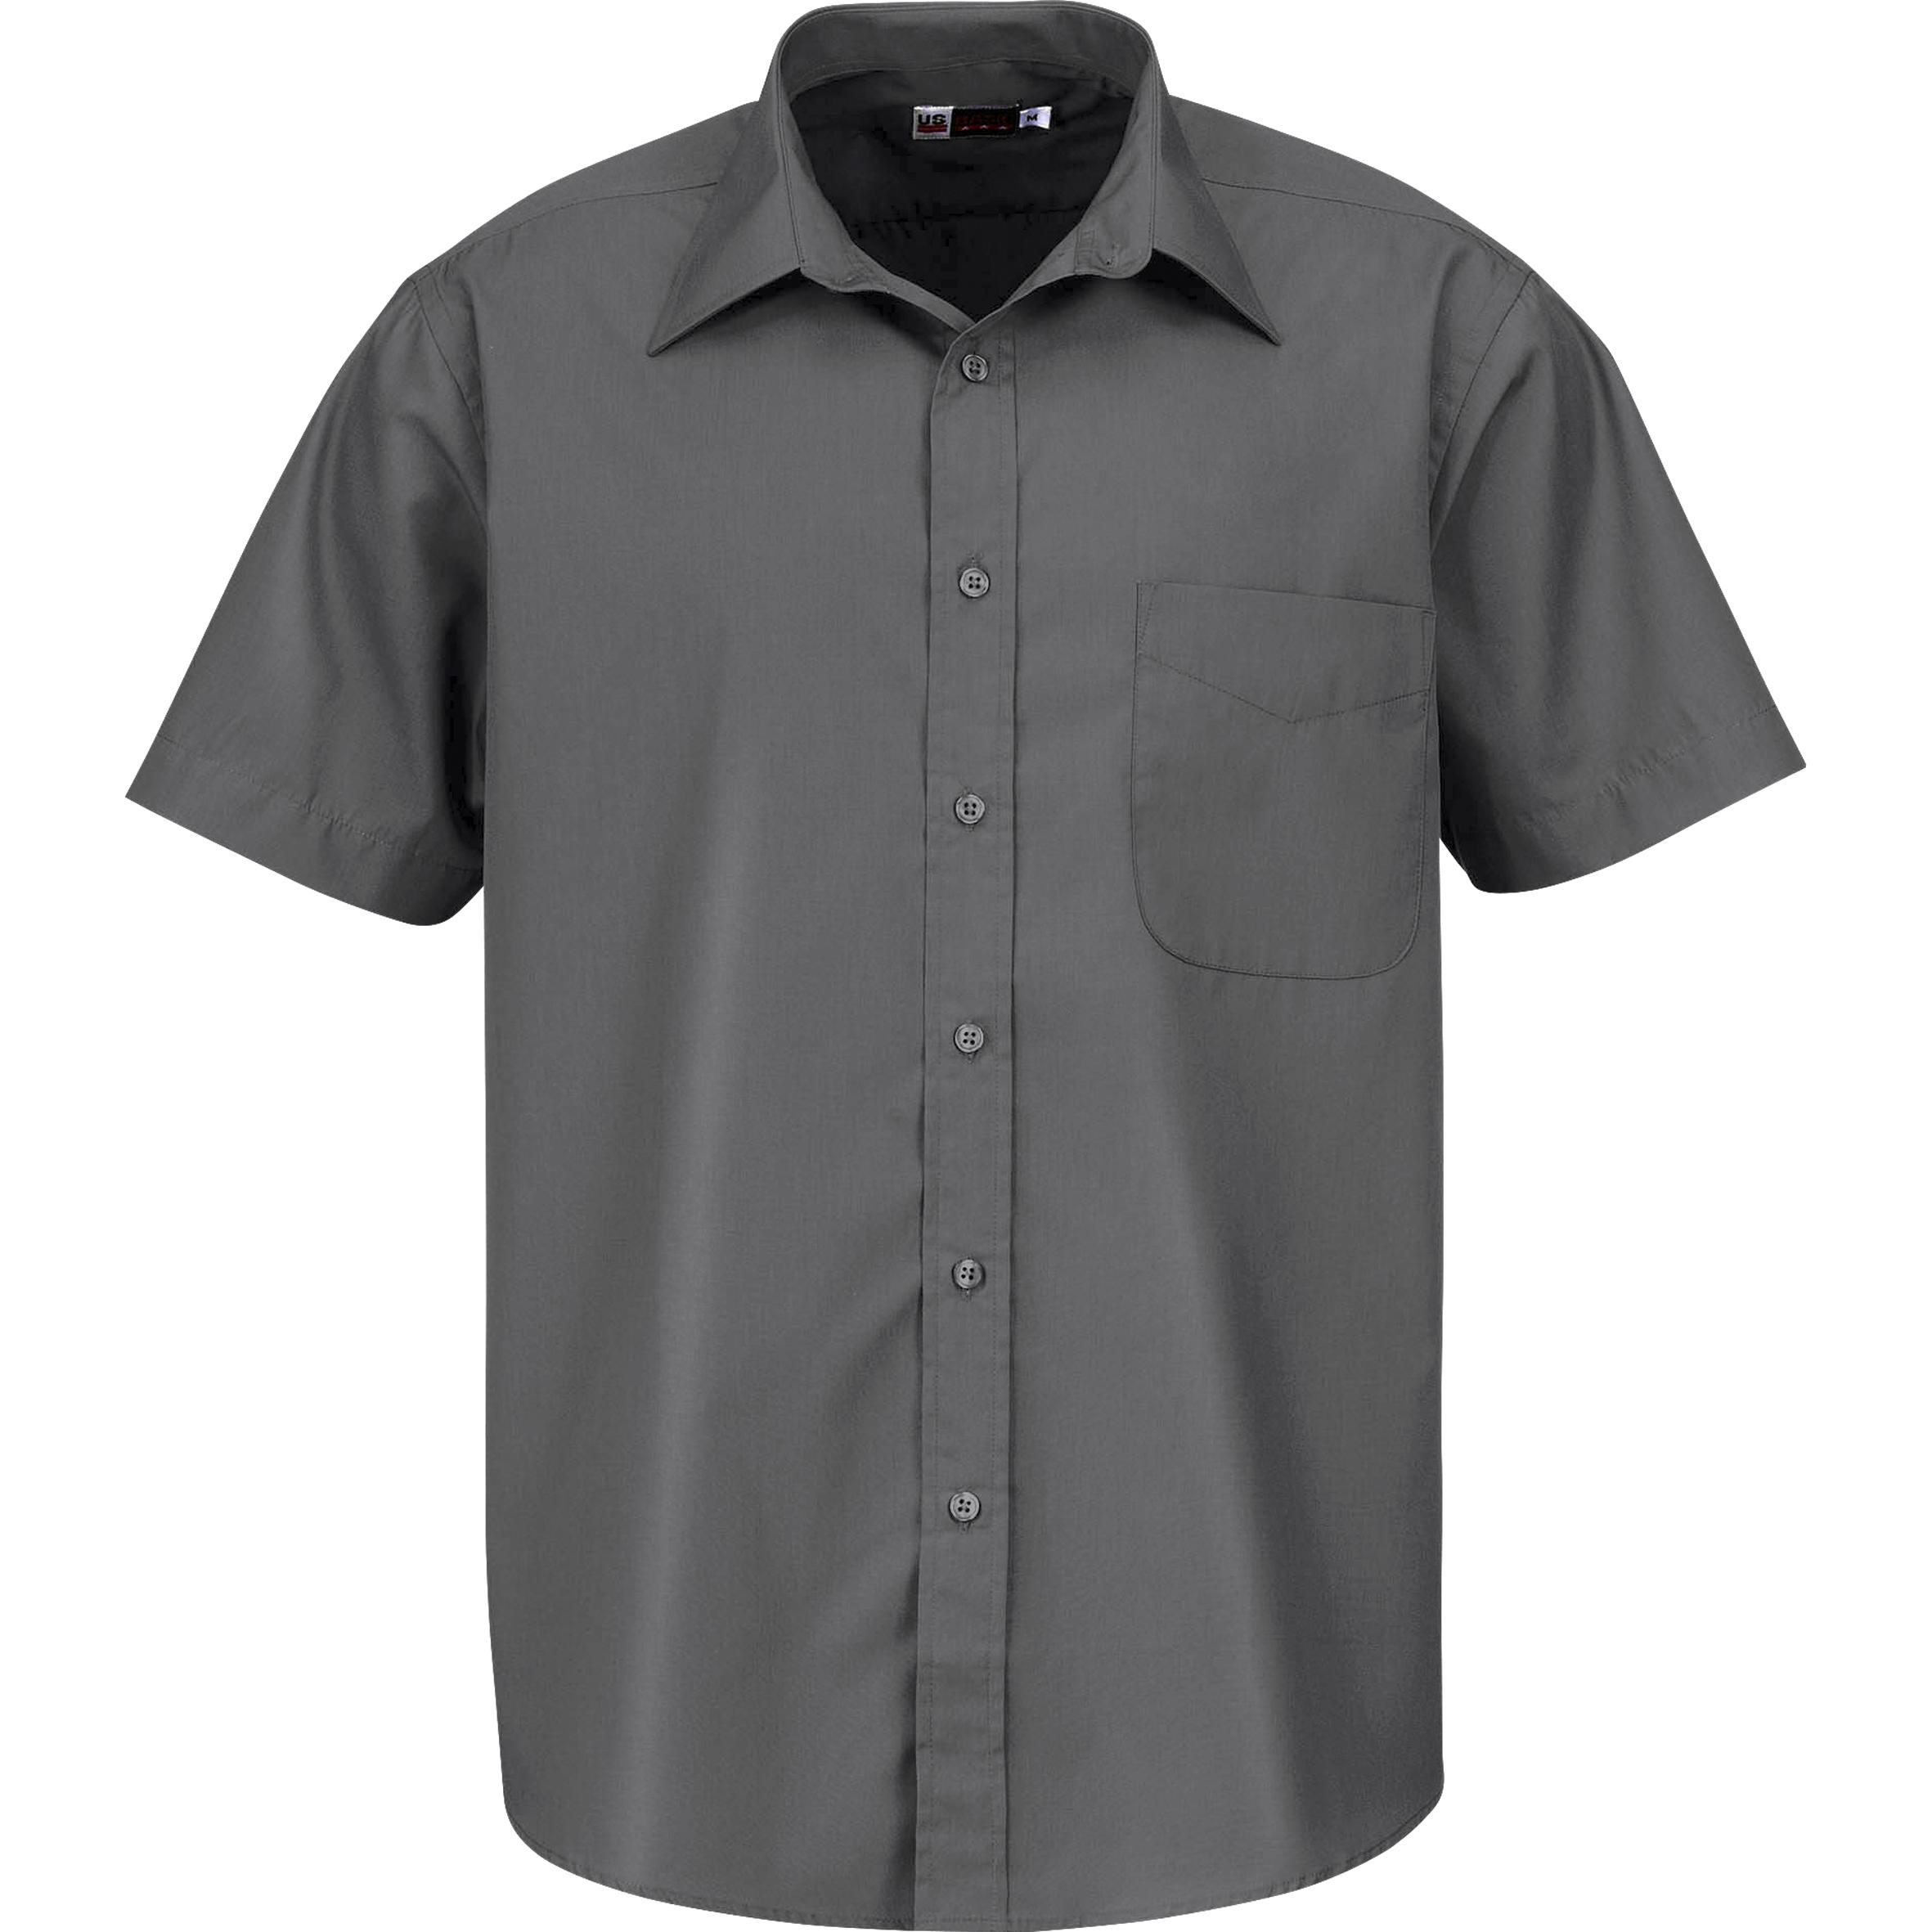 Mens Short Sleeve Washington Shirt - Grey Only